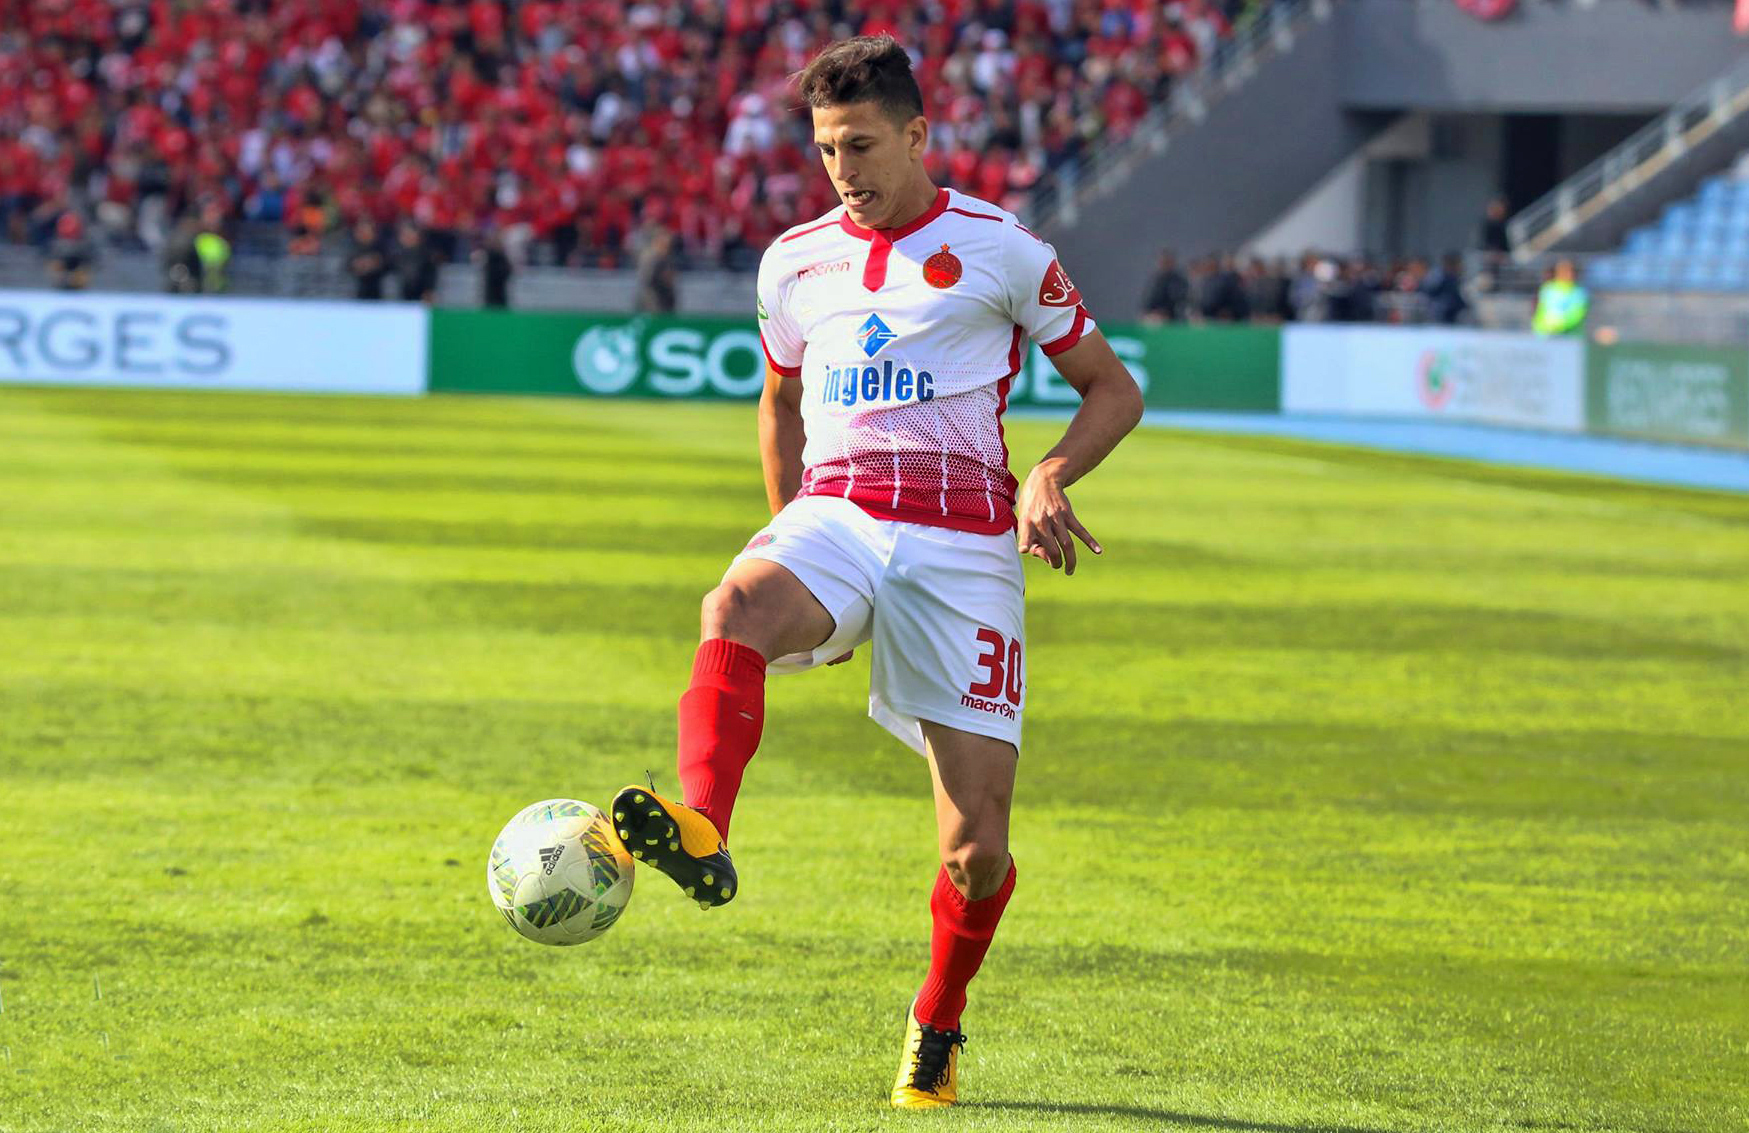 Transfert/Arabie Saoudite : Le Marocain Mohamed Nahiri s'engage pour 2 saisons à Al Ain